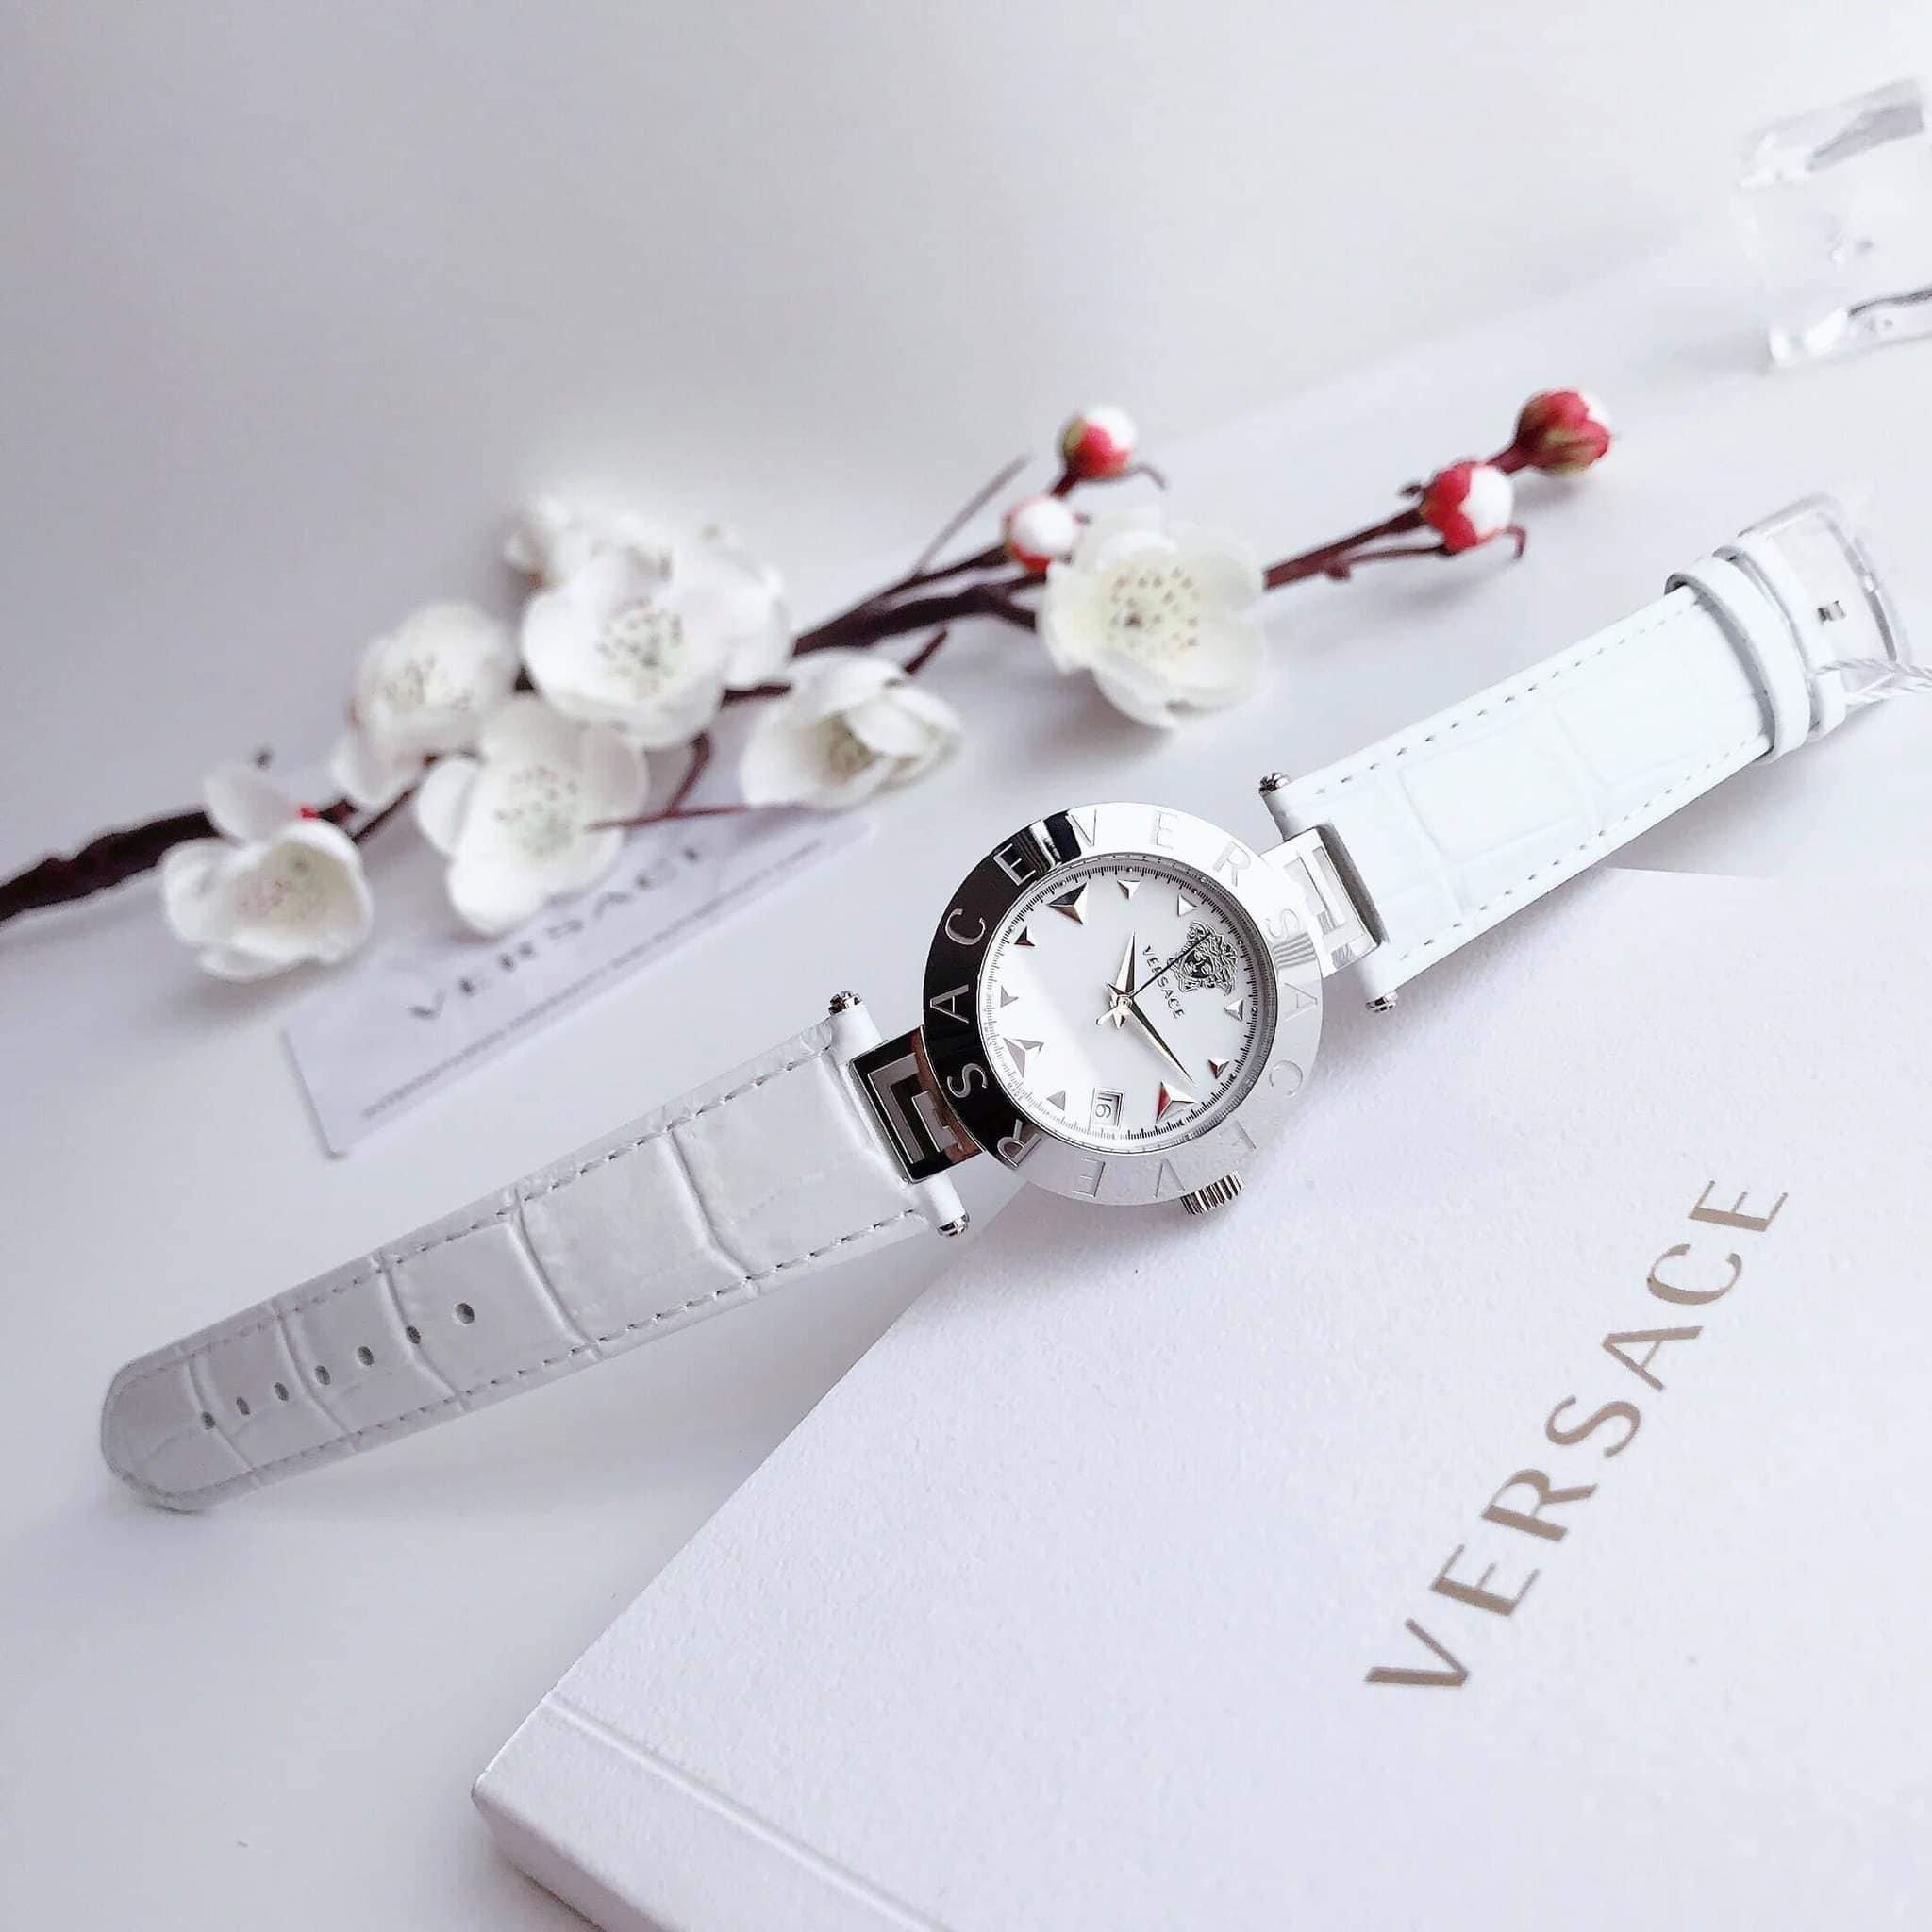 Đồng Hồ Nữ Versace Reve - VEWS00118